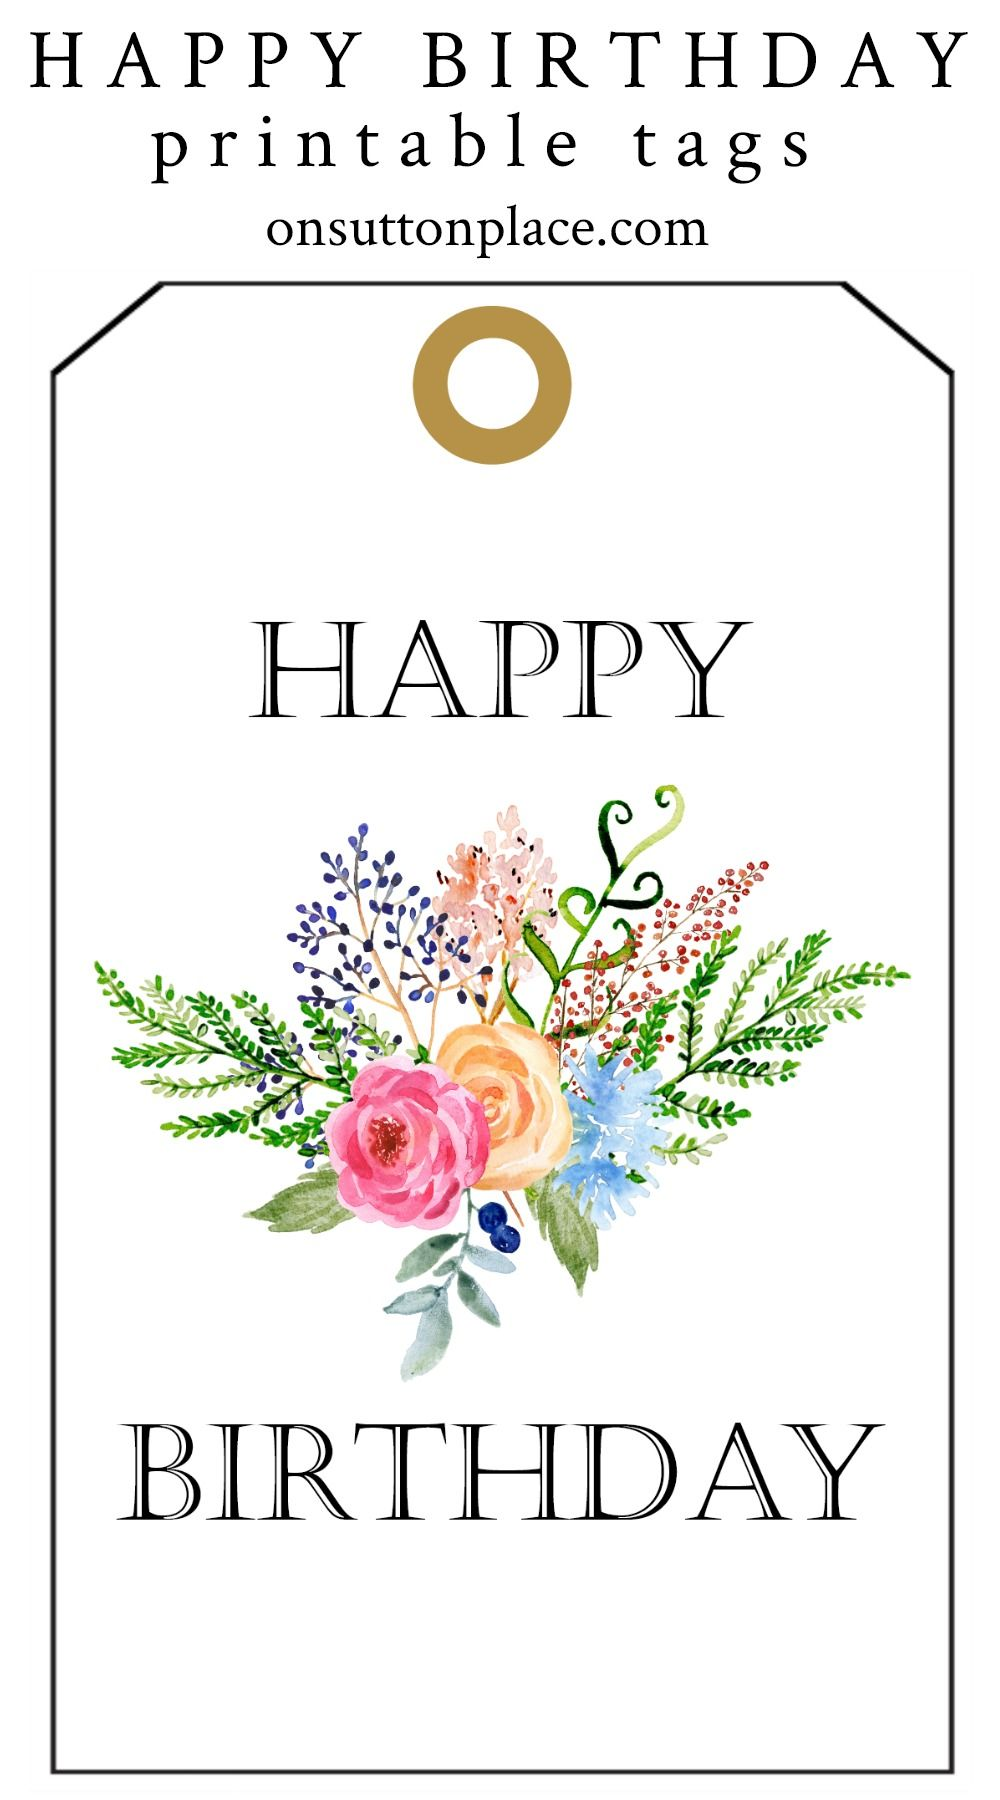 Happy Birthday Free Printable Gift Tags